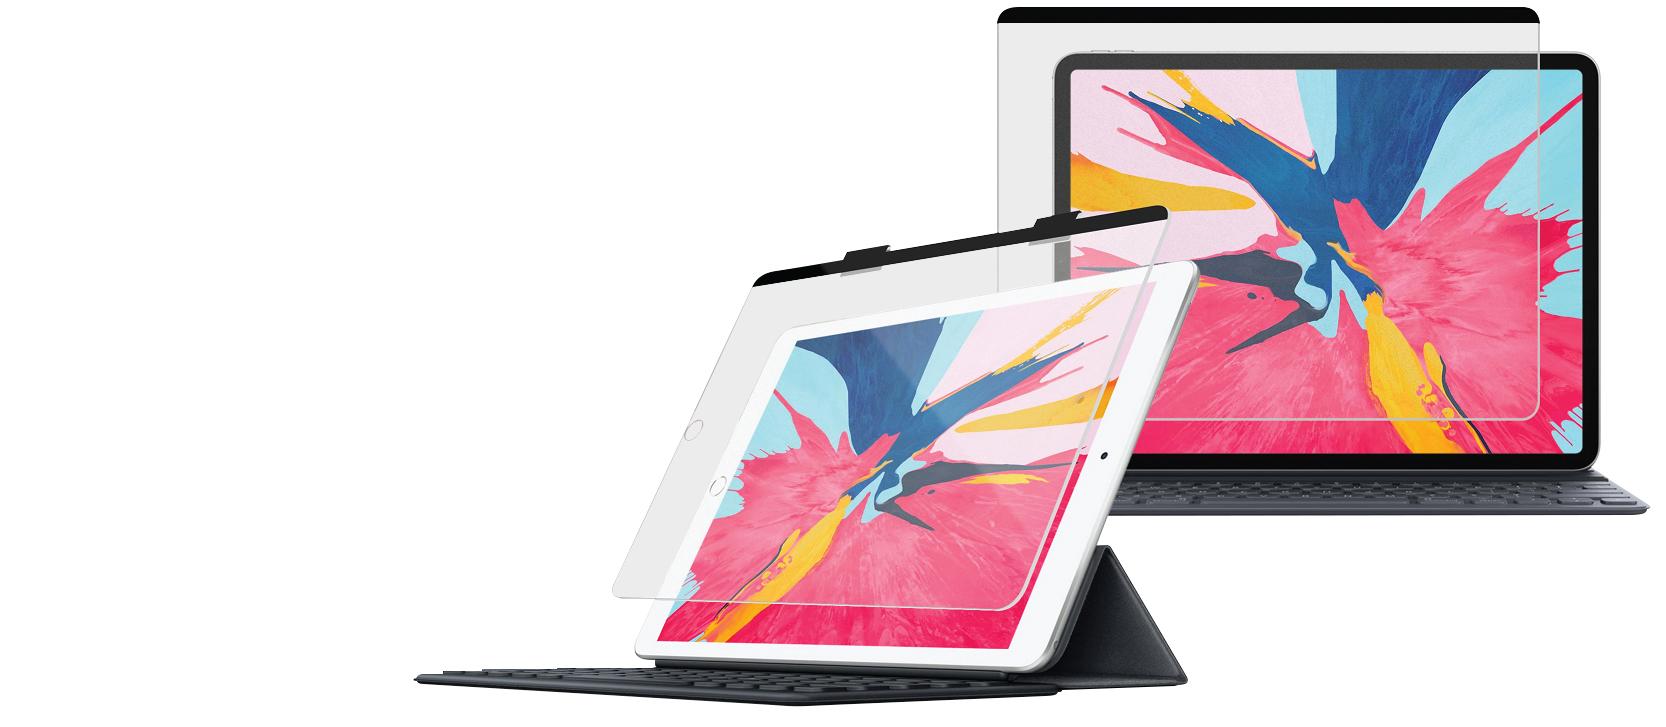 Product_Bluelight-iPad-02-OK